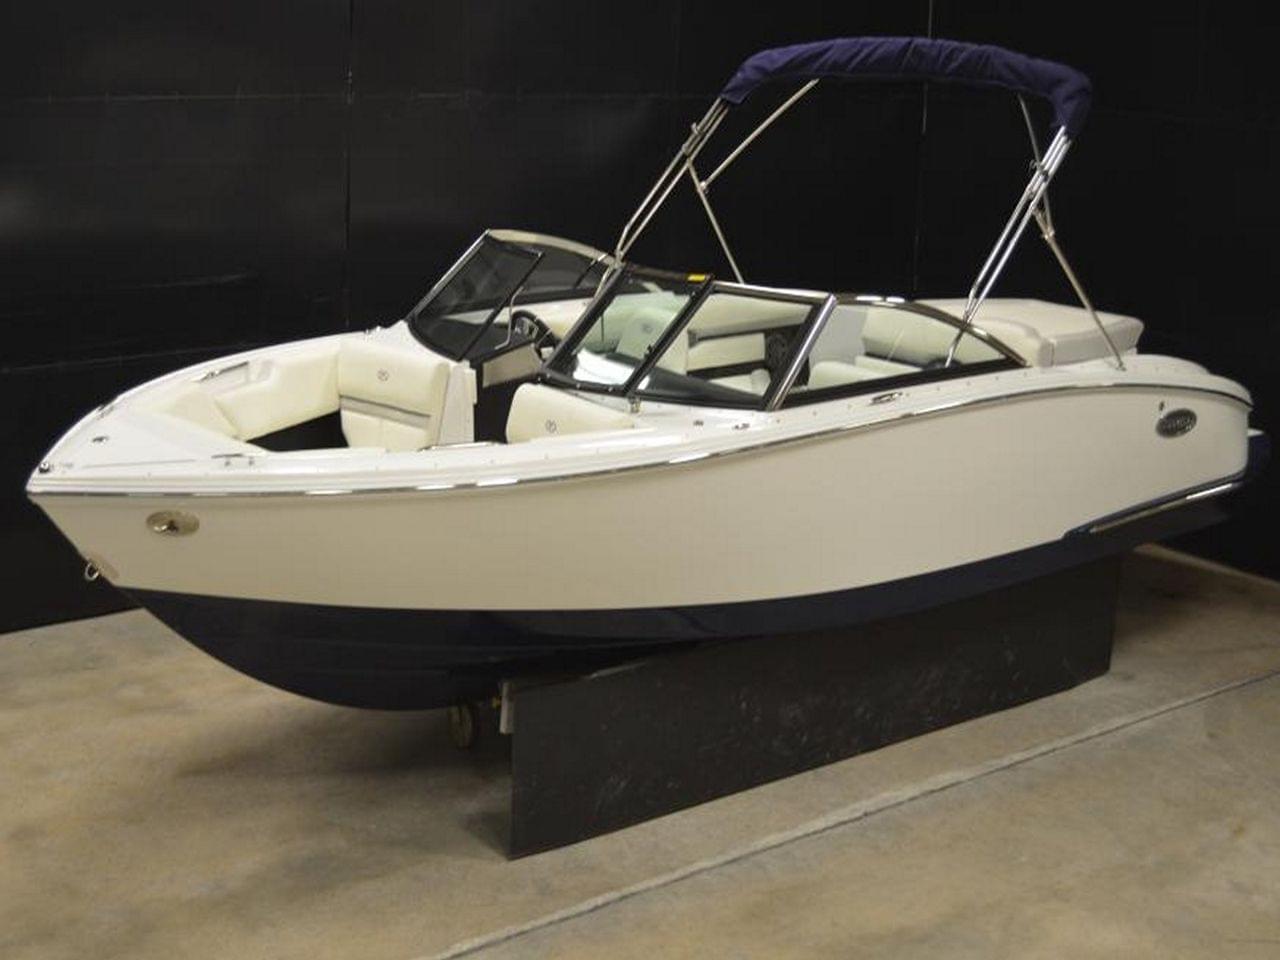 2016 Cobalt Cs3 Power Boat For Sale Www Yachtworld Com